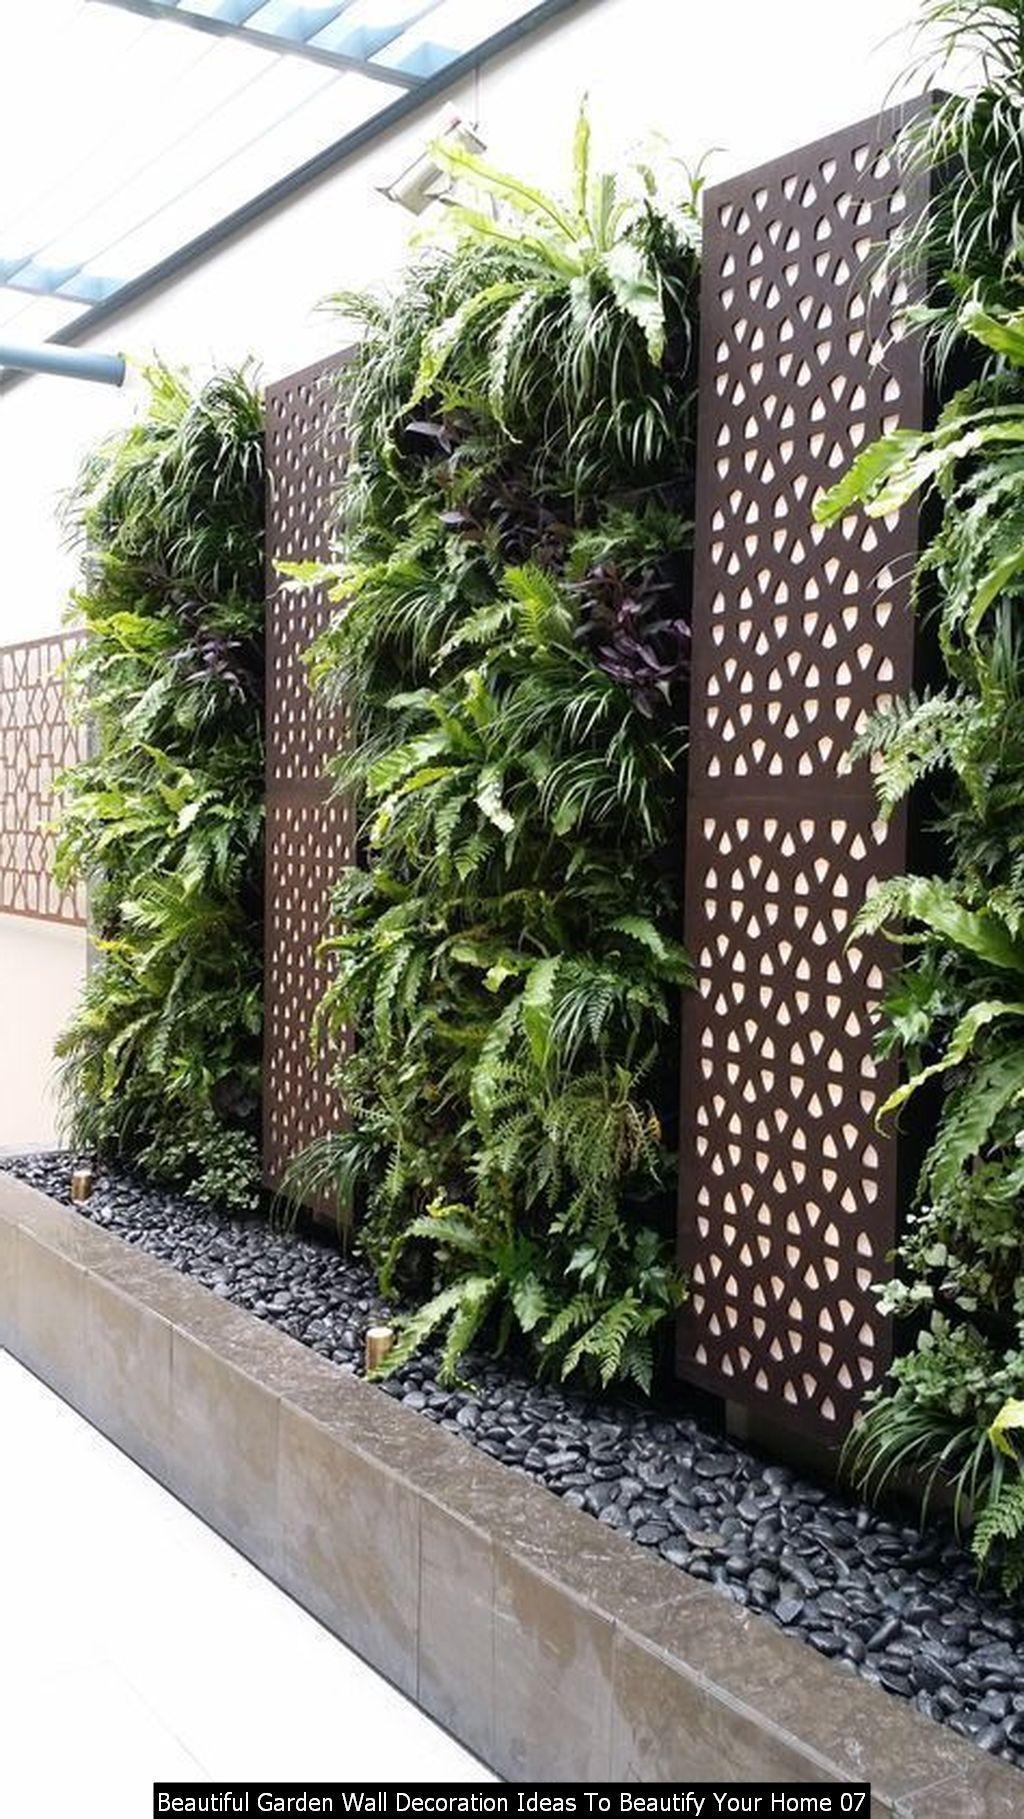 30 Beautiful Garden Wall Decoration Ideas To Beautify Your Home Garden Wall Garden Wall Decor Vertical Garden Design